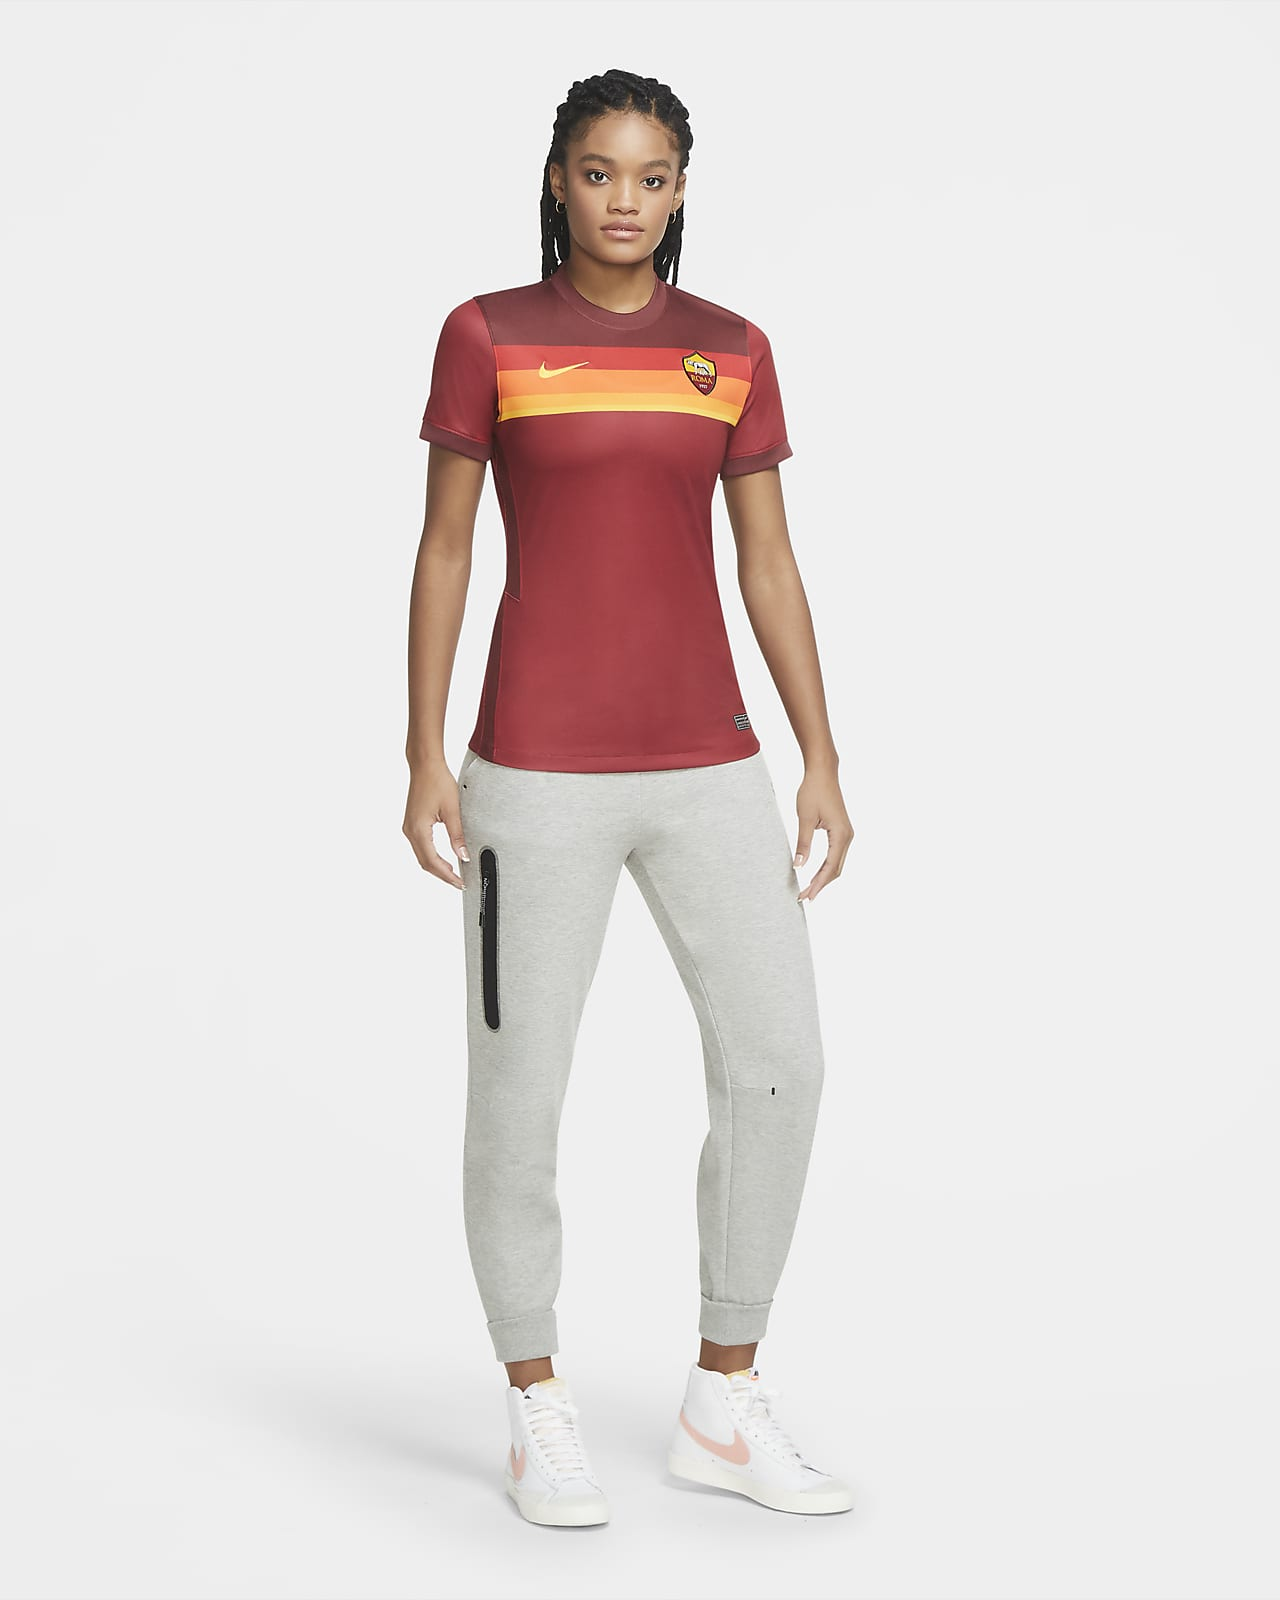 AS Roma 2020/21 Stadium Home Women's Football Shirt